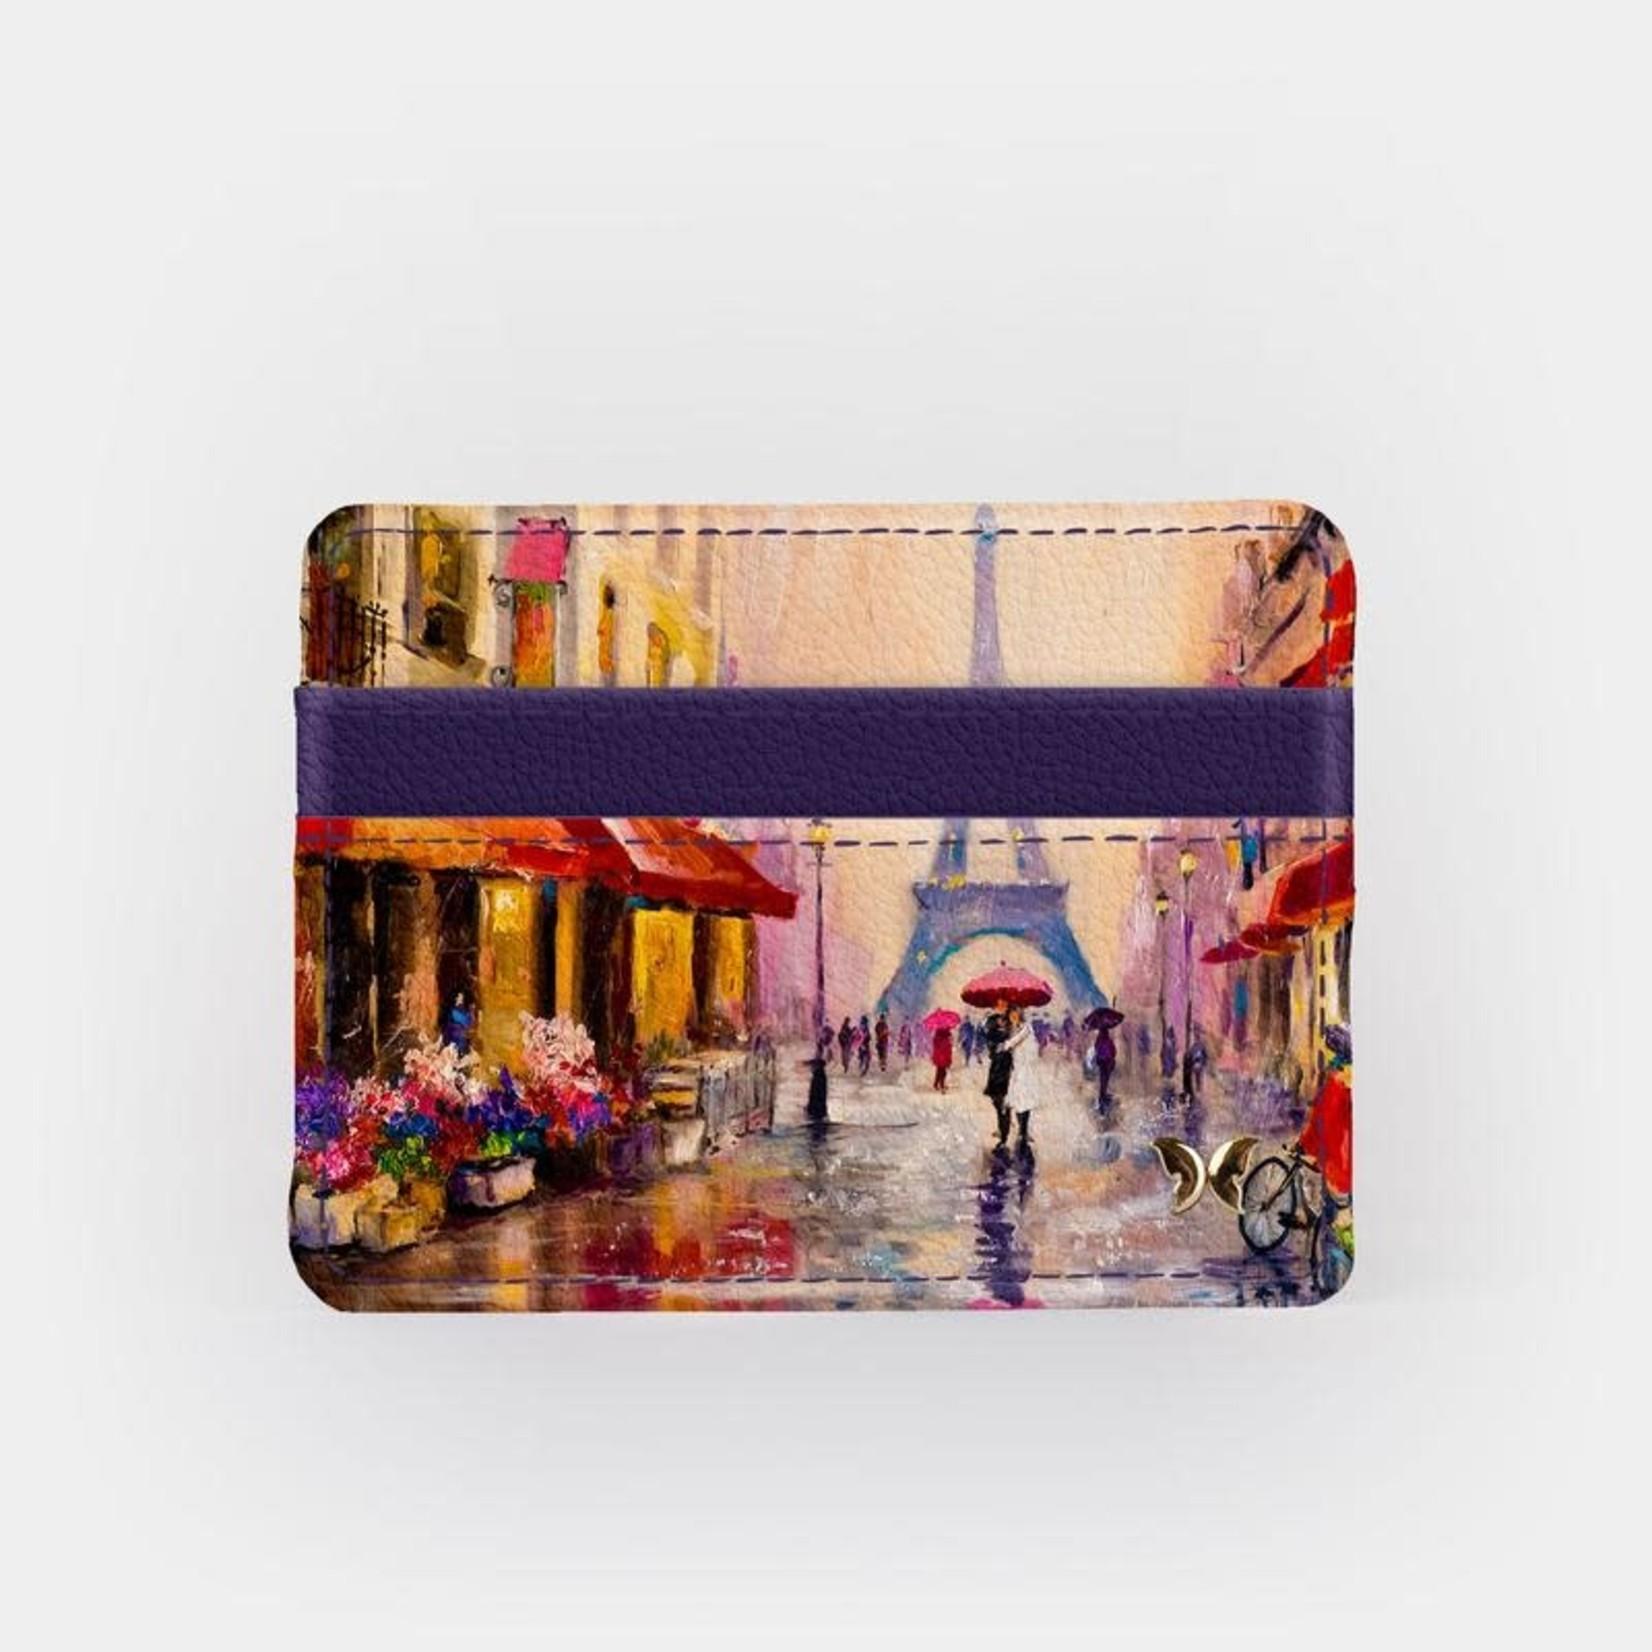 Monarque Slim Wallet - Travel Paris